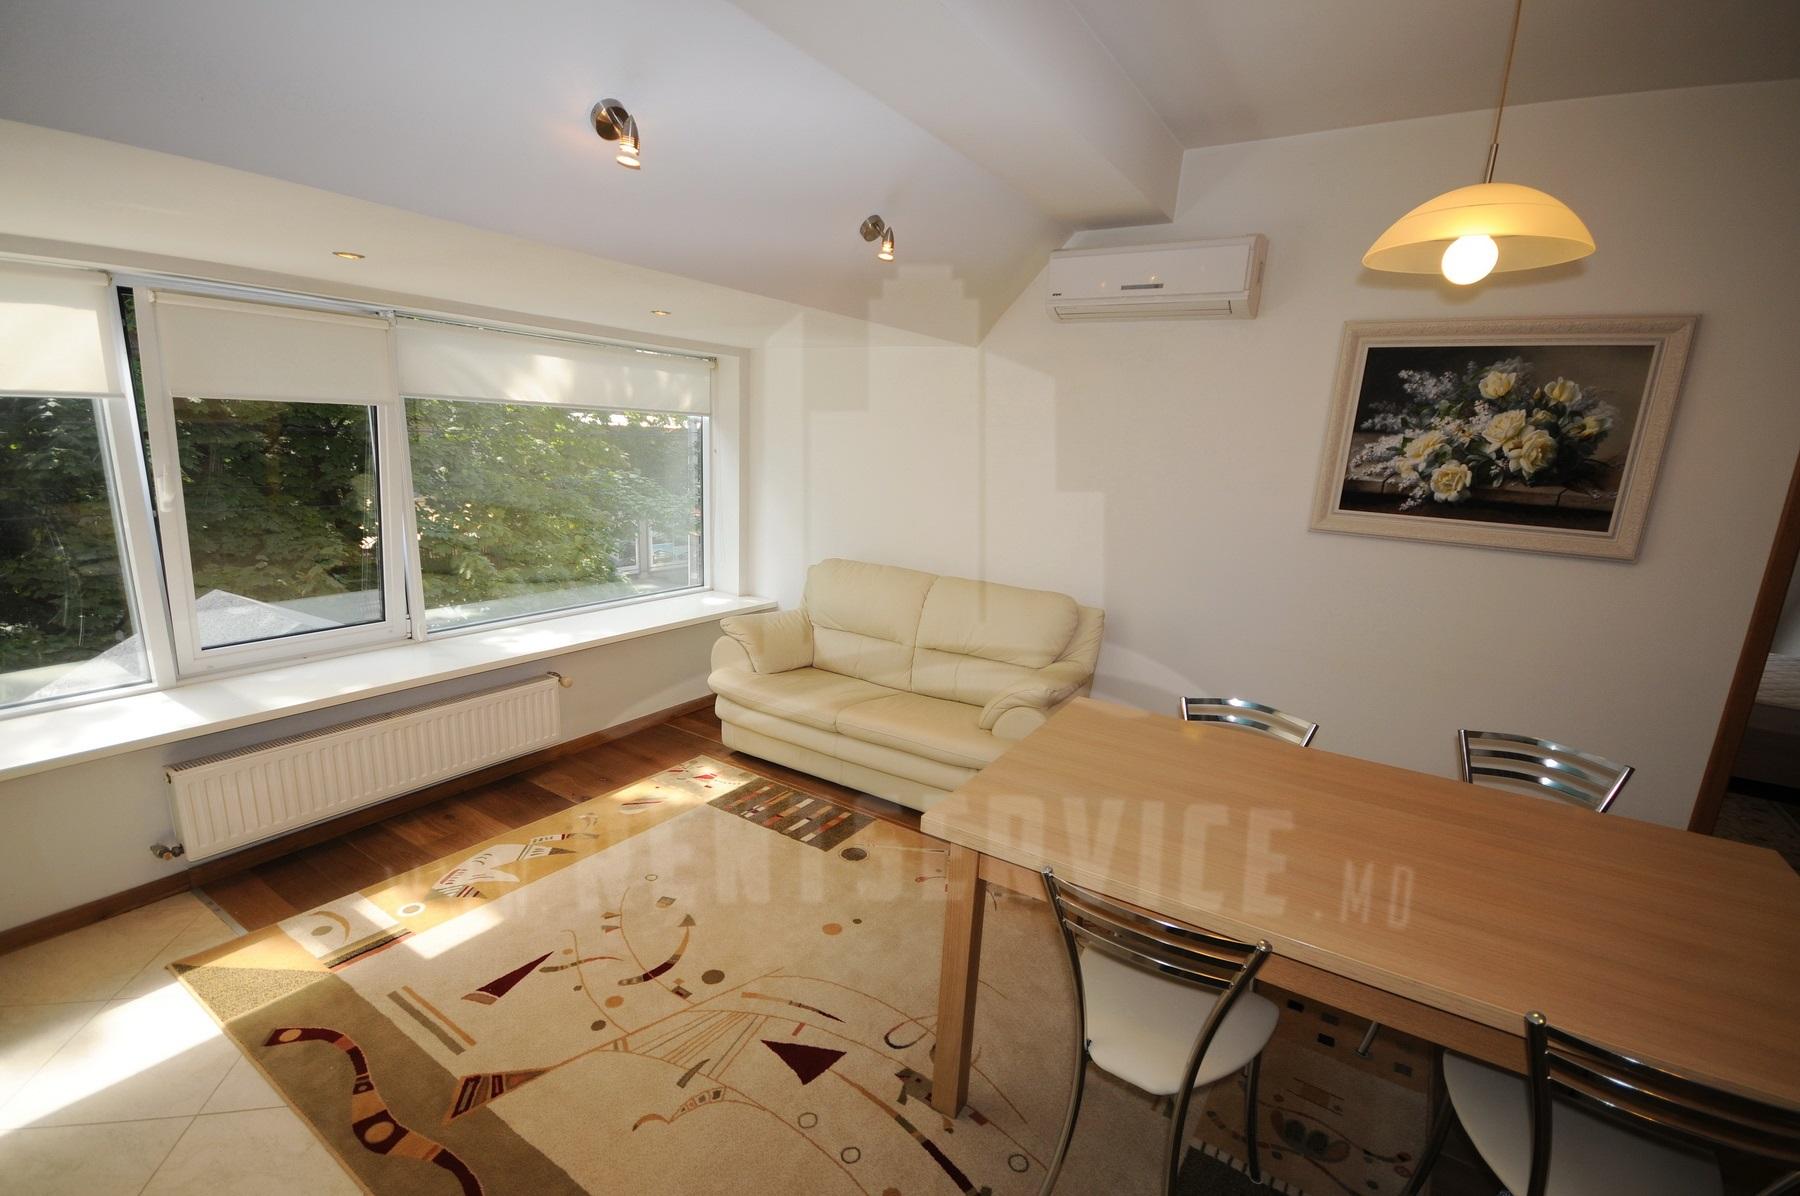 267_apartment_1.JPG